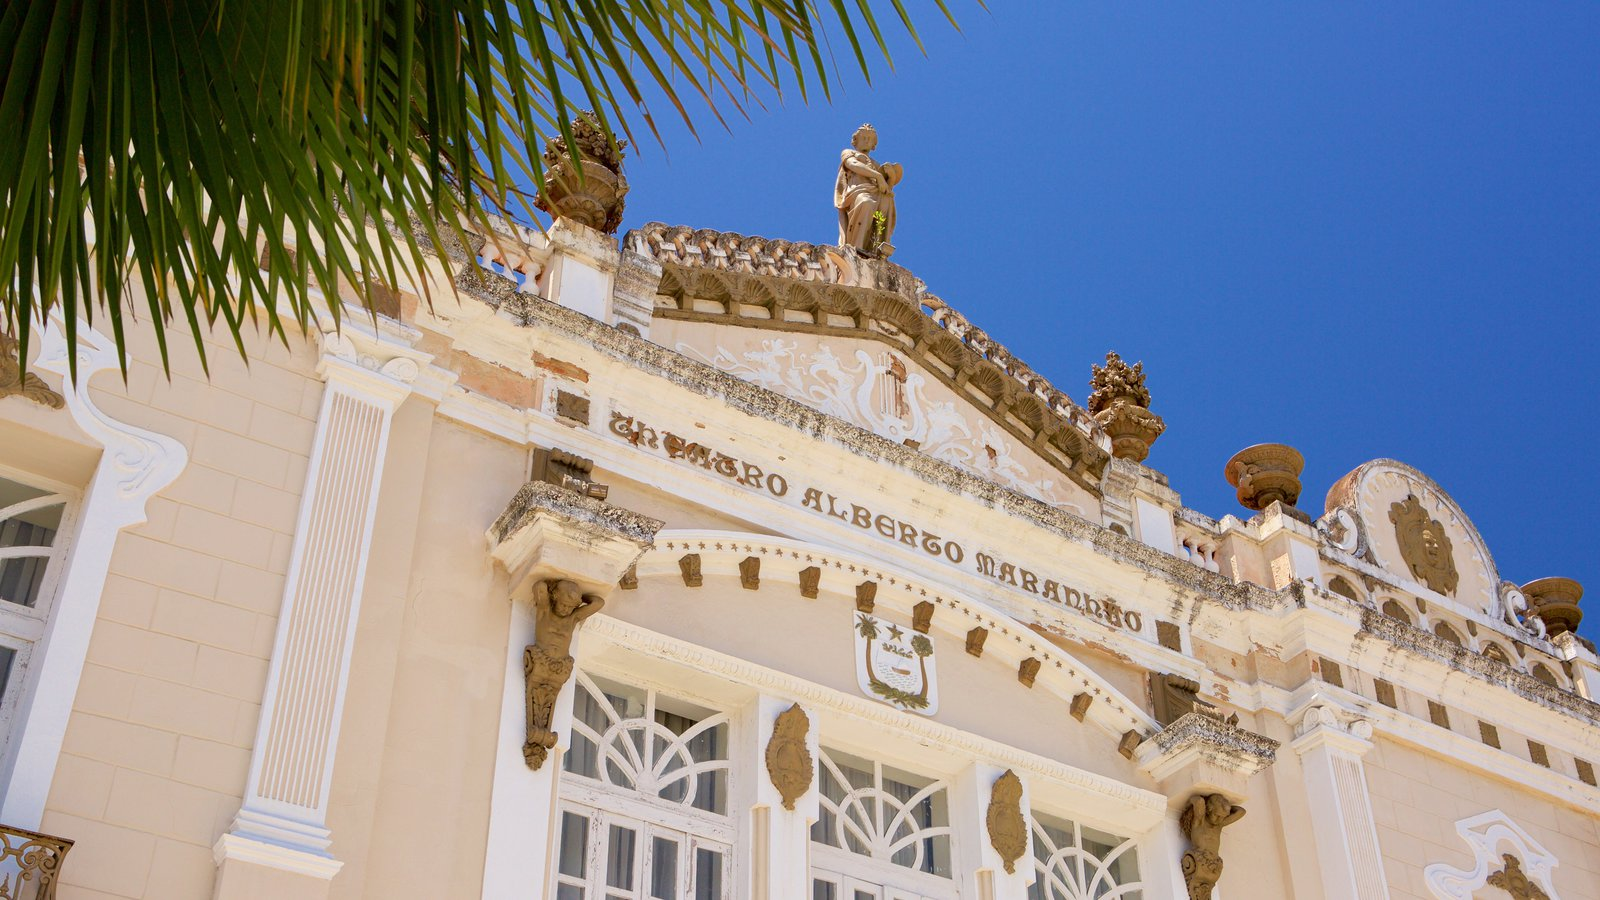 Teatro Alberto Maranhão caracterizando elementos de patrimônio e cenas de teatro